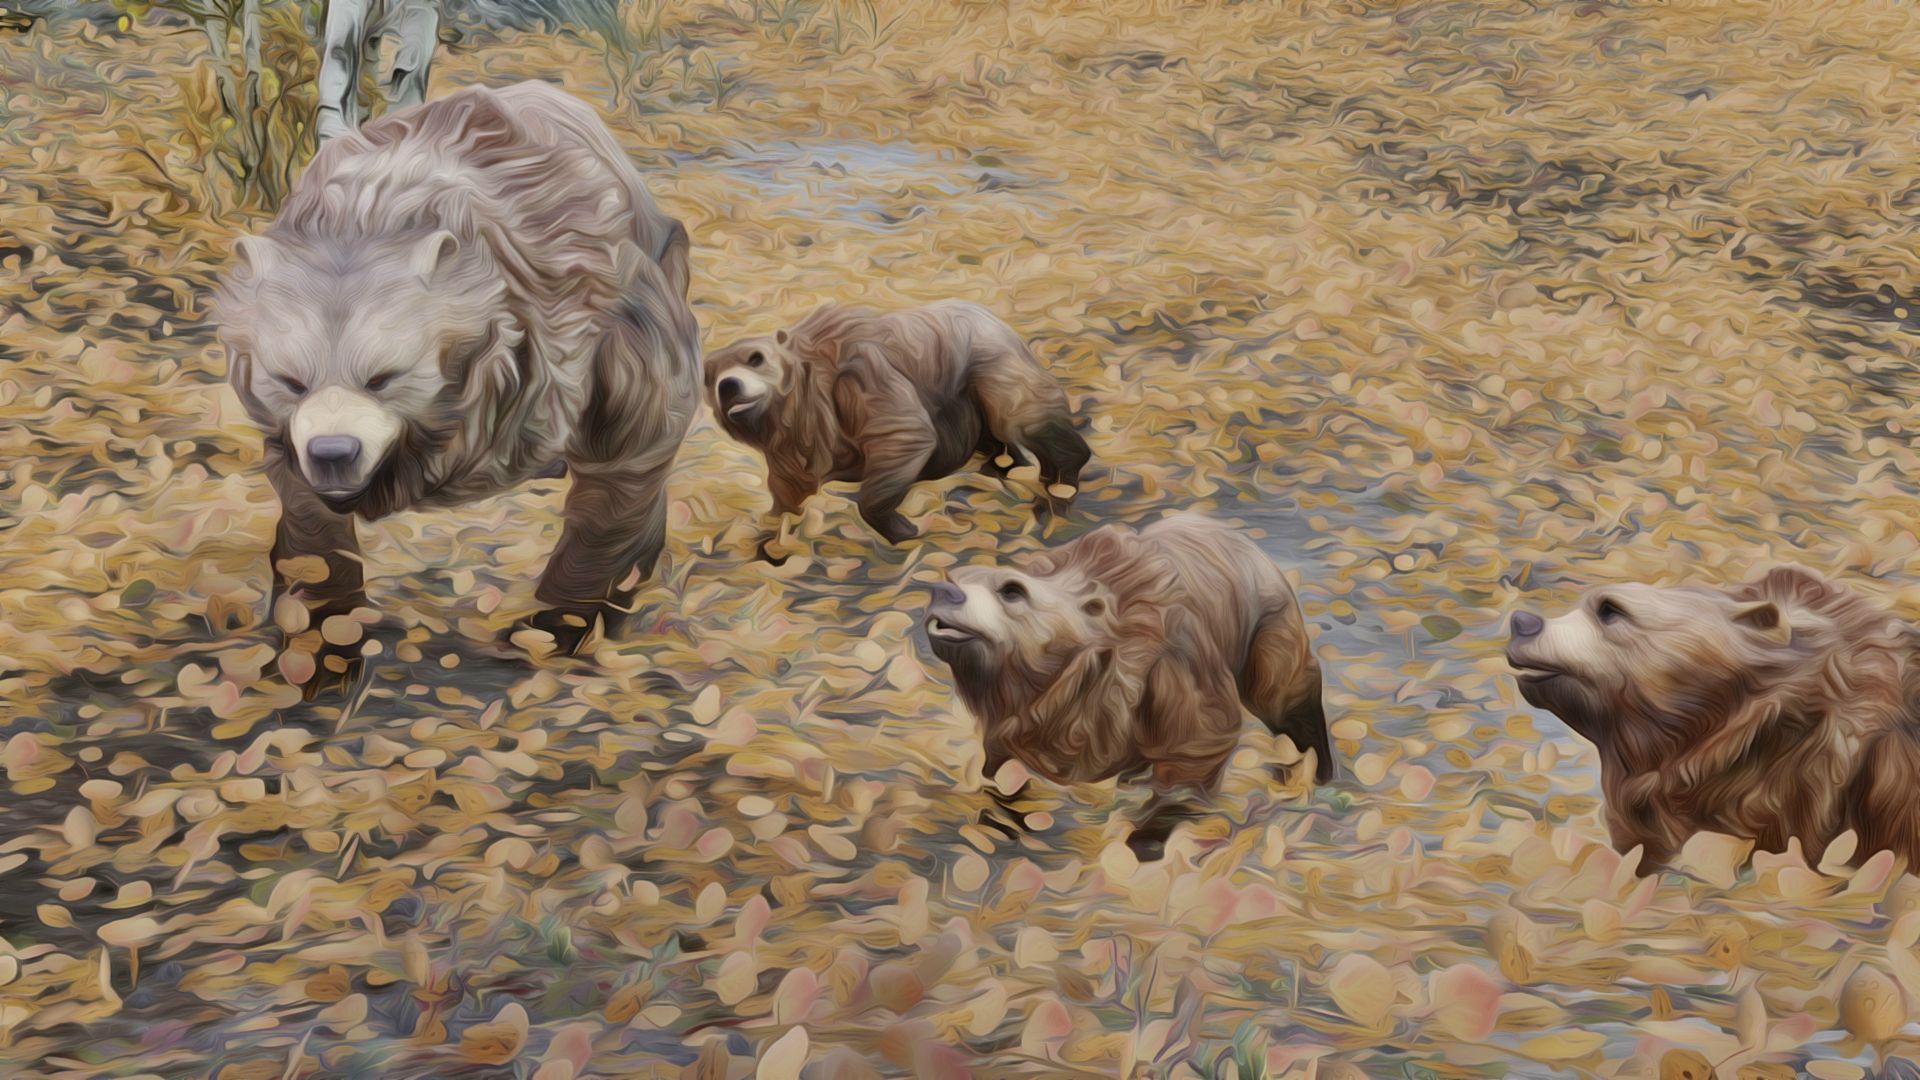 A Family of Bears - oil filtered Skyrim